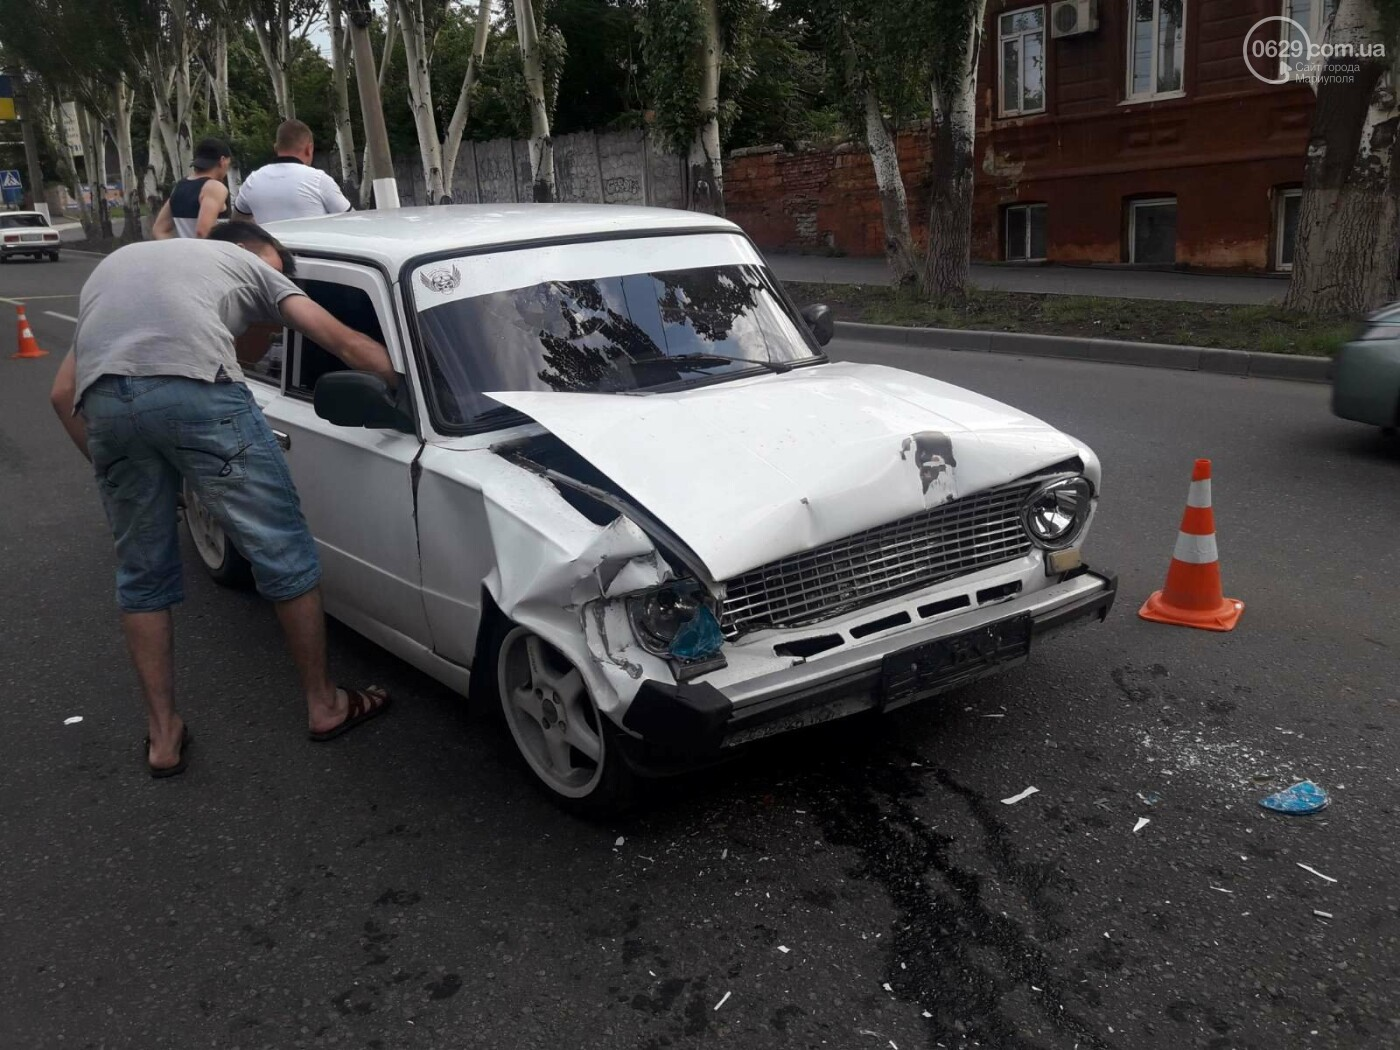 В Мариуполе «копейка» влетела в грузовик. Пострадала девушка, - ФОТО, фото-4